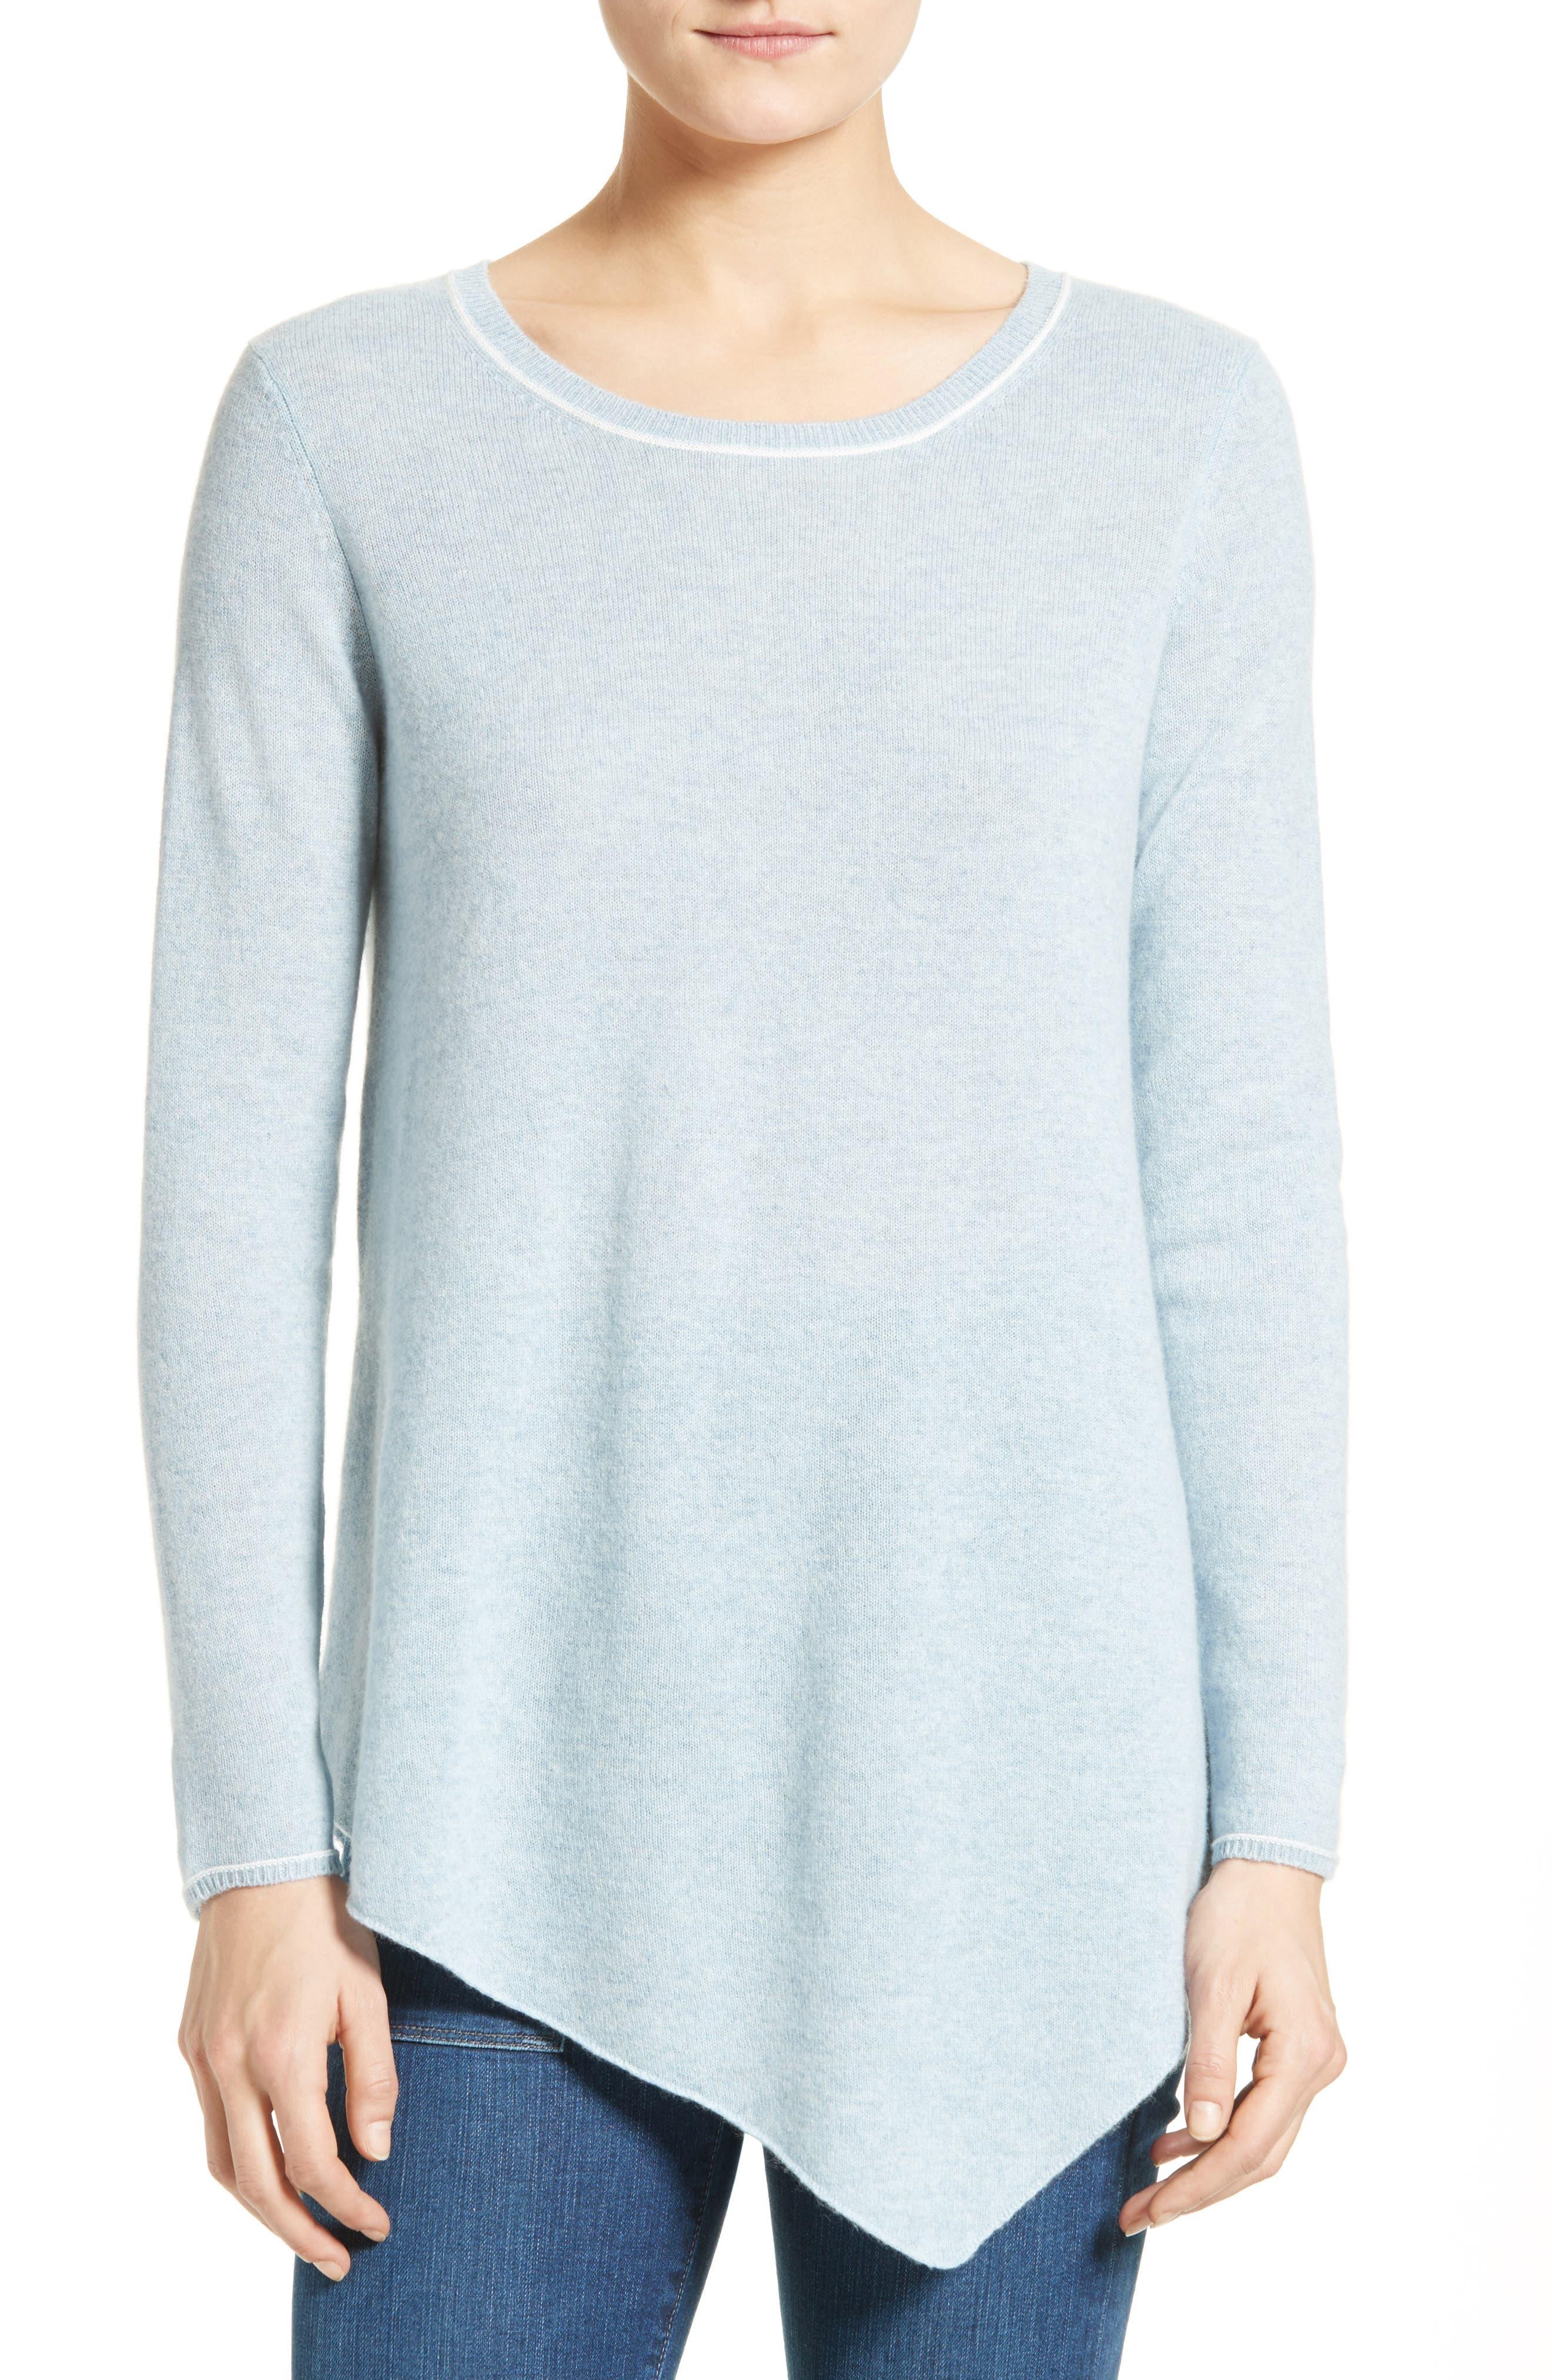 Tambrel H Asymmetrical Hem Cashmere Sweater,                             Main thumbnail 1, color,                             400